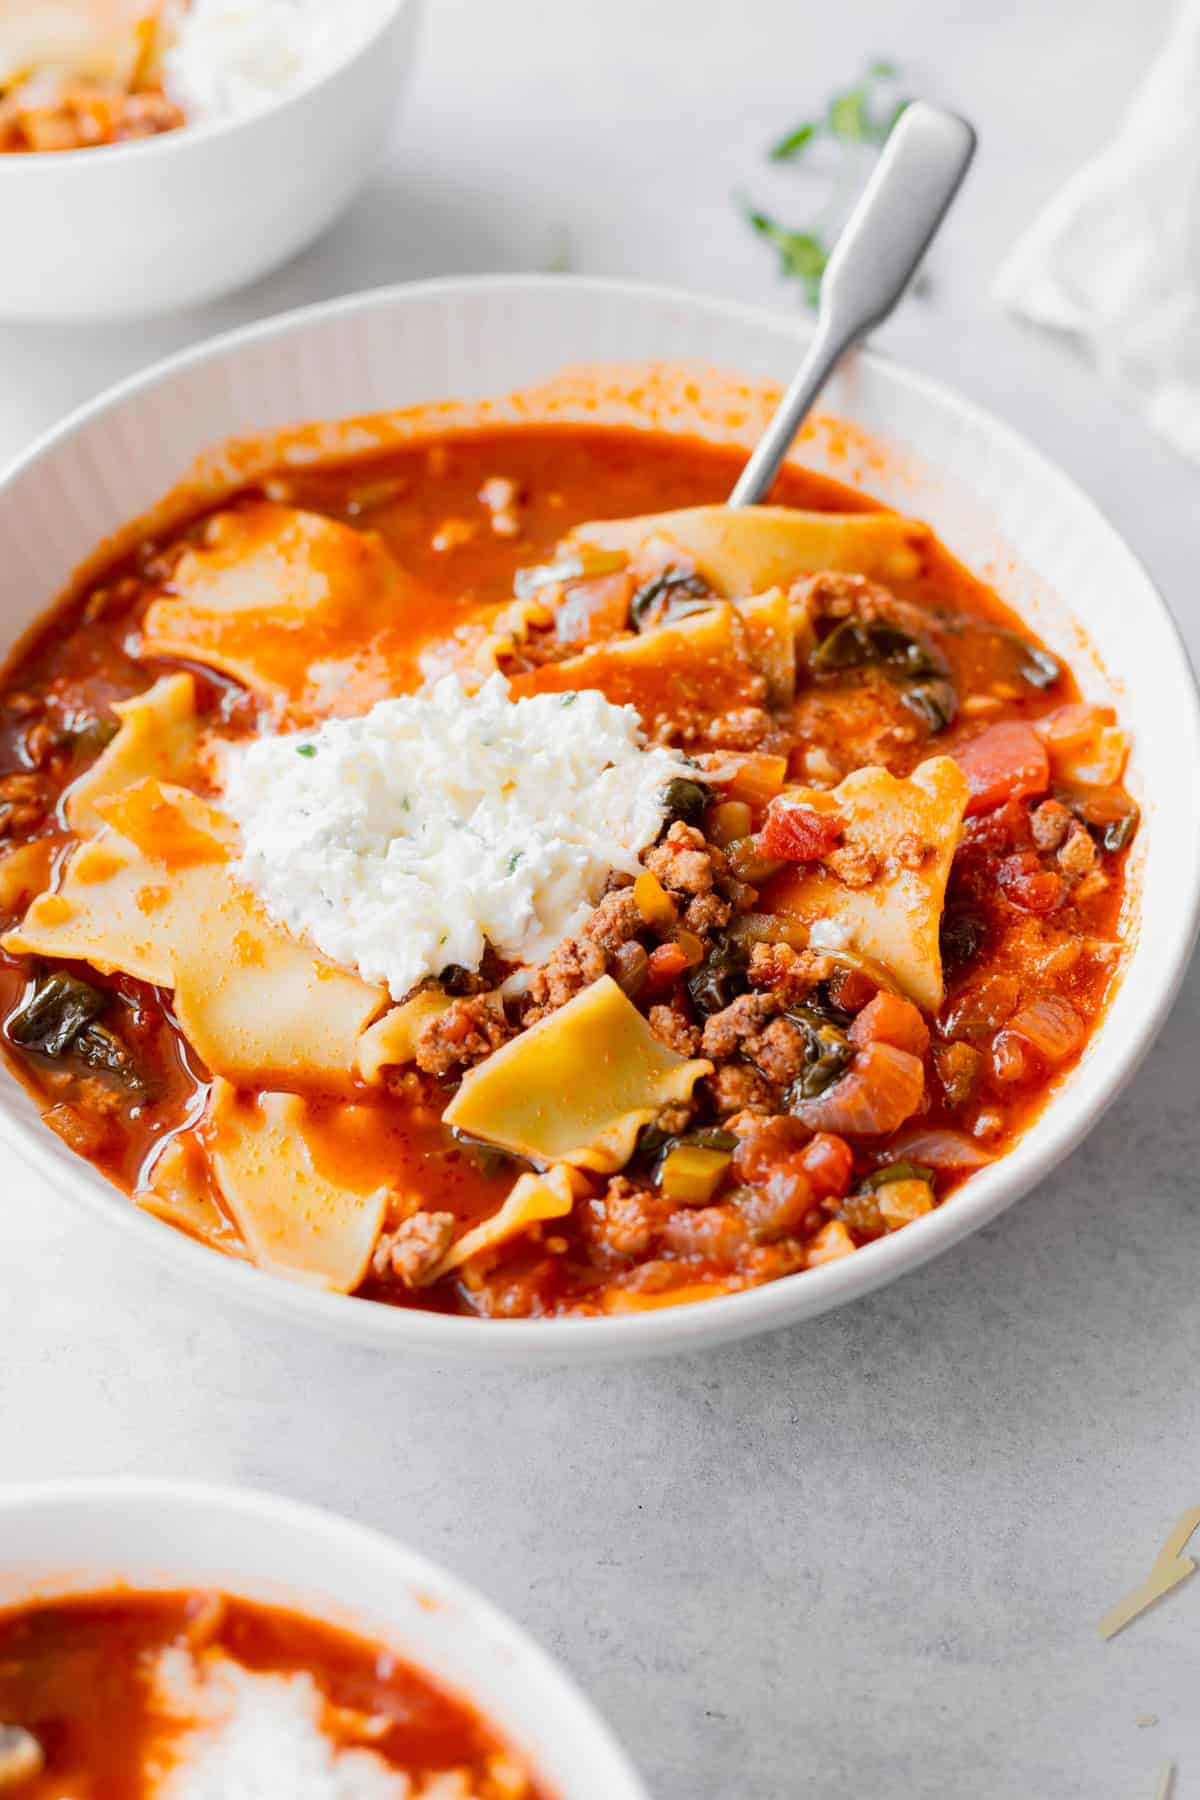 Lasagna soup in a bowl.